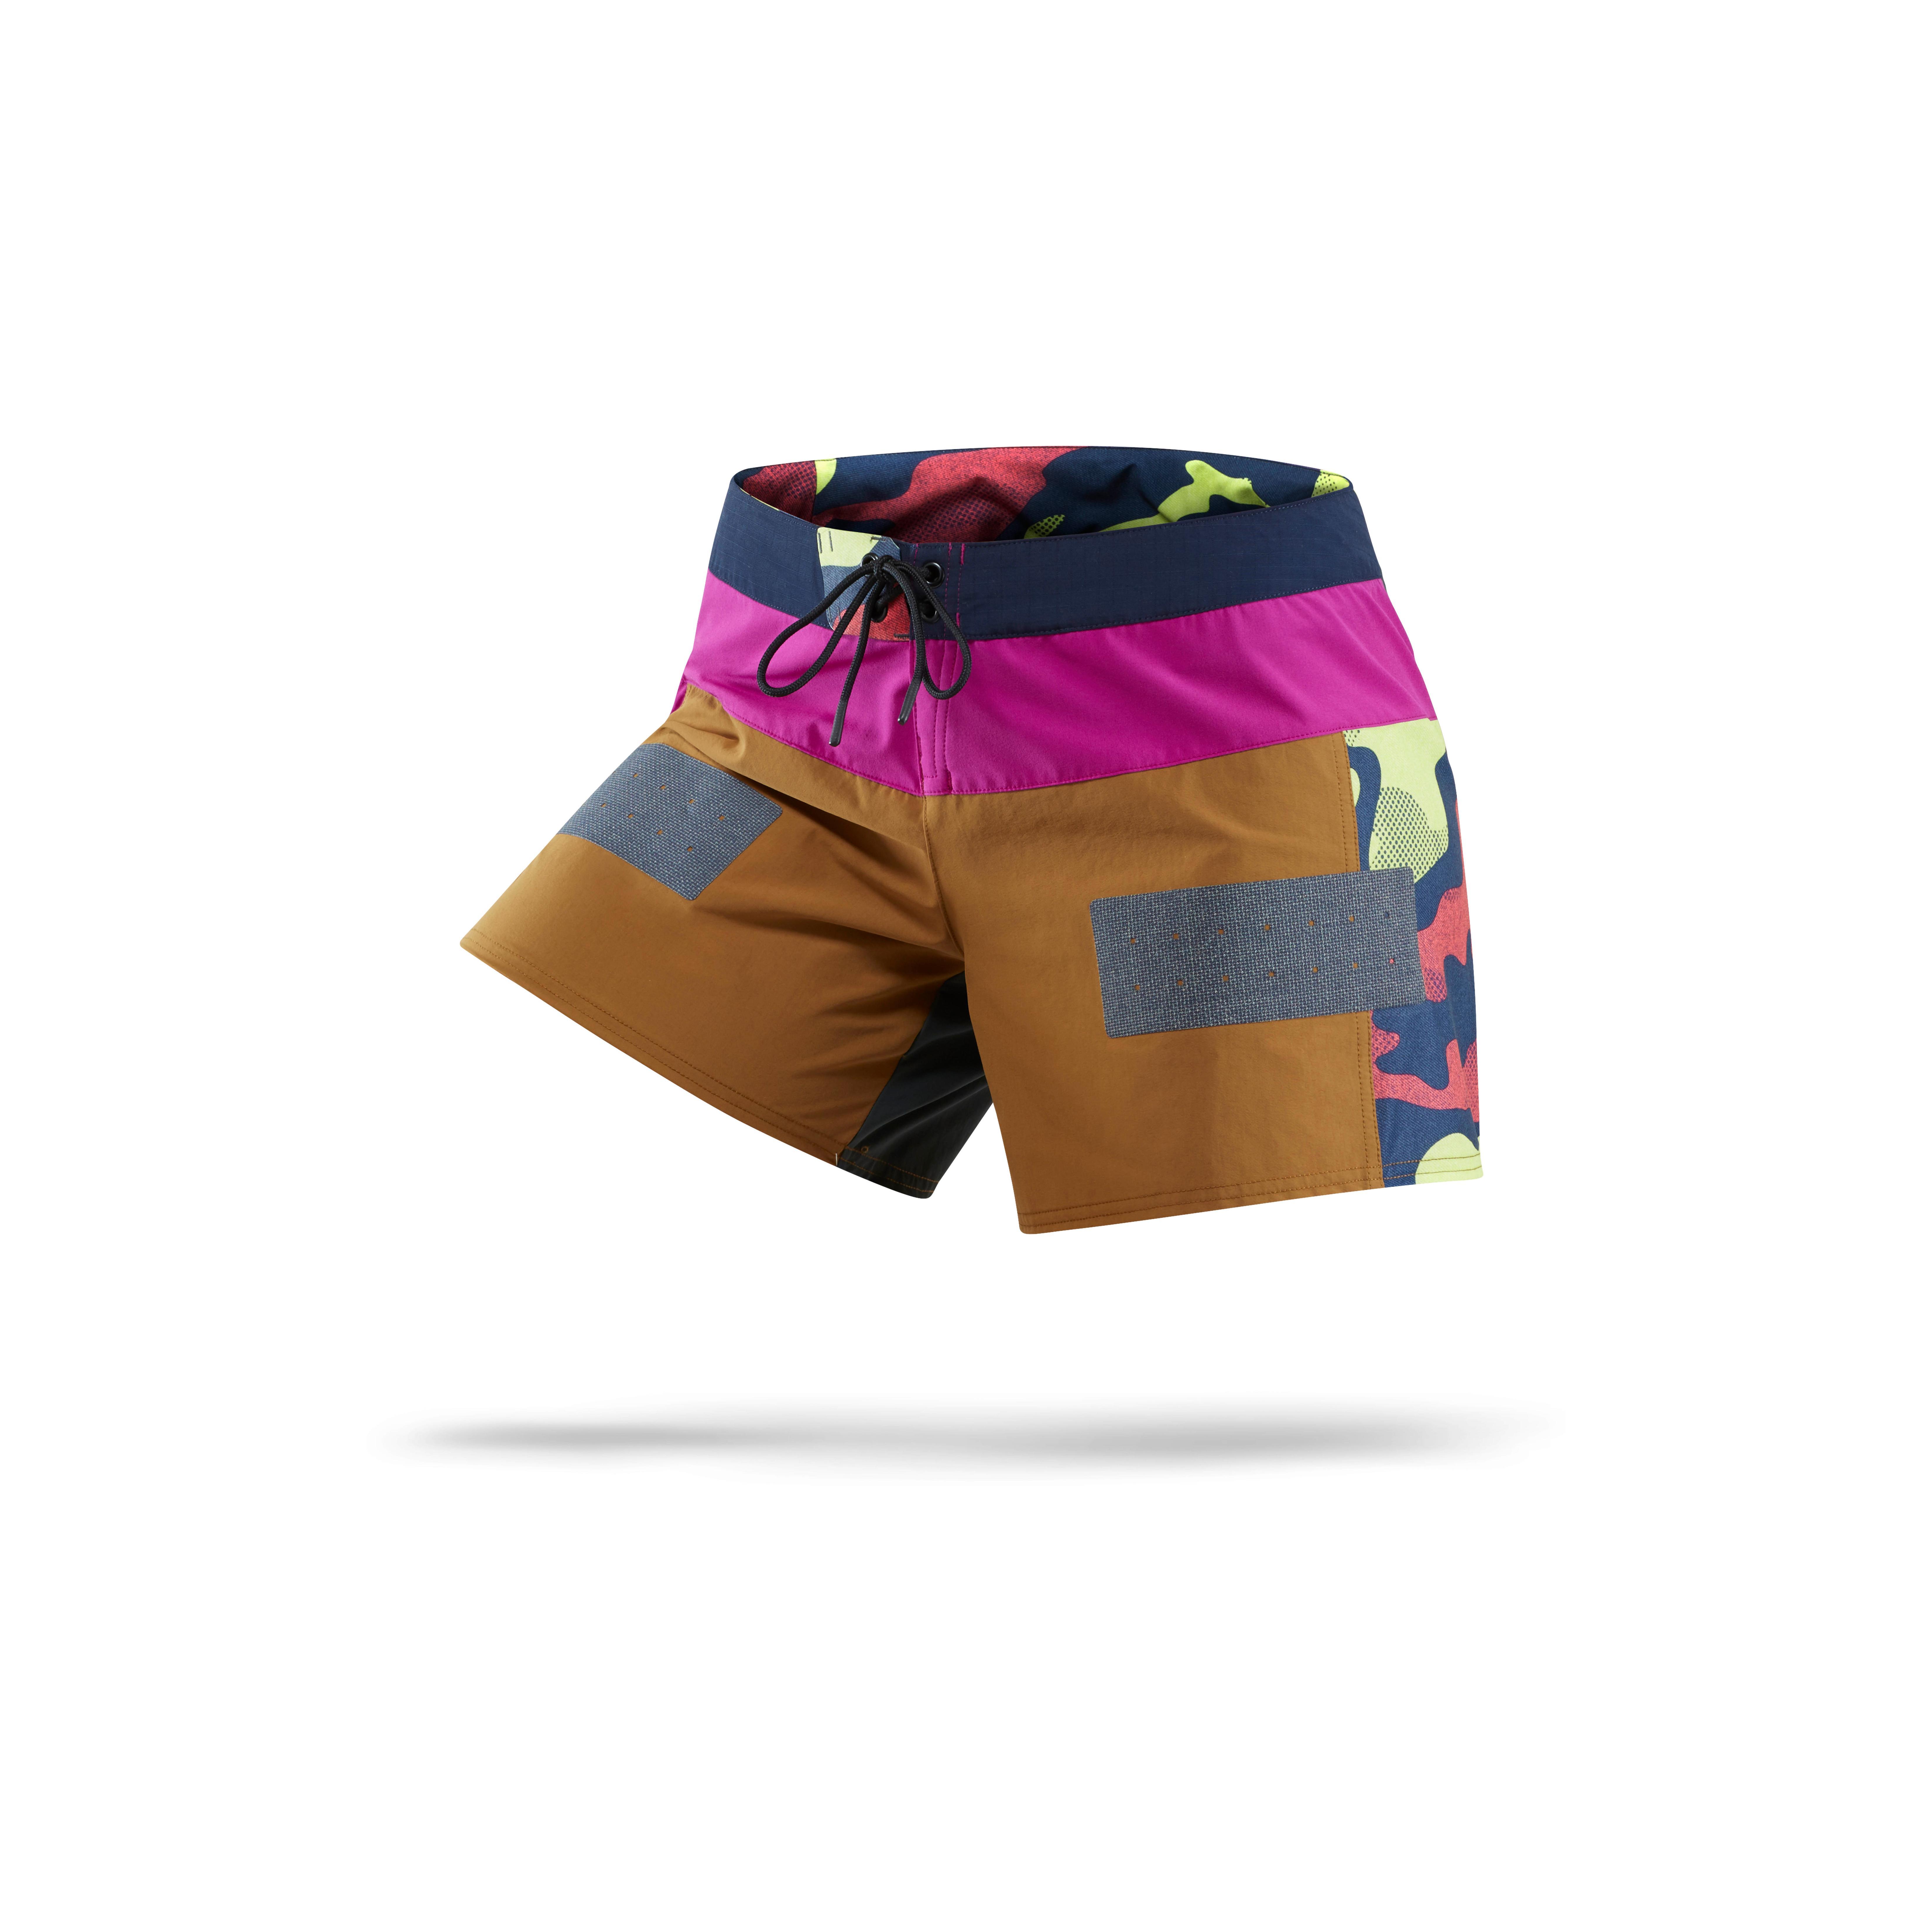 kevlar femmes femmes reebok shorts reebok wPk0O8nX